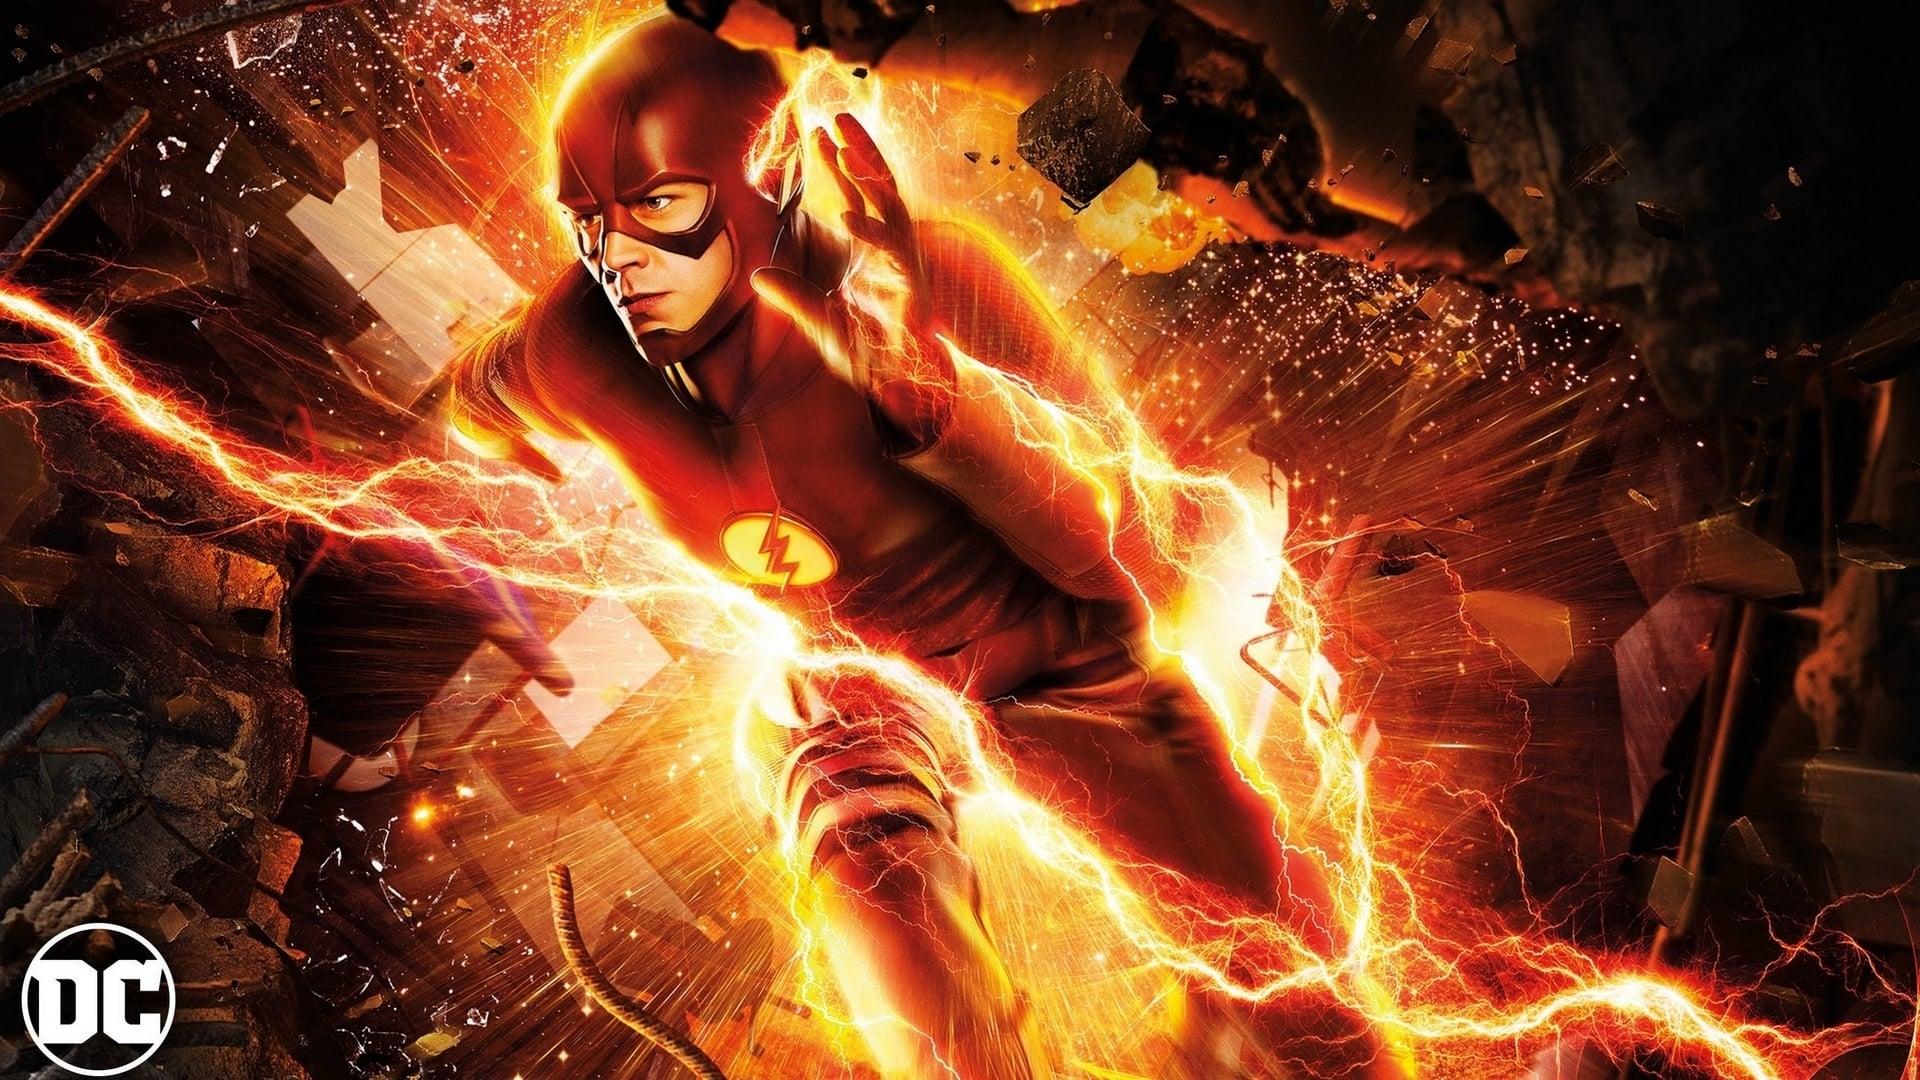 The Flash 2020 Wallpaper, HD TV Series 4K Wallpapers ...